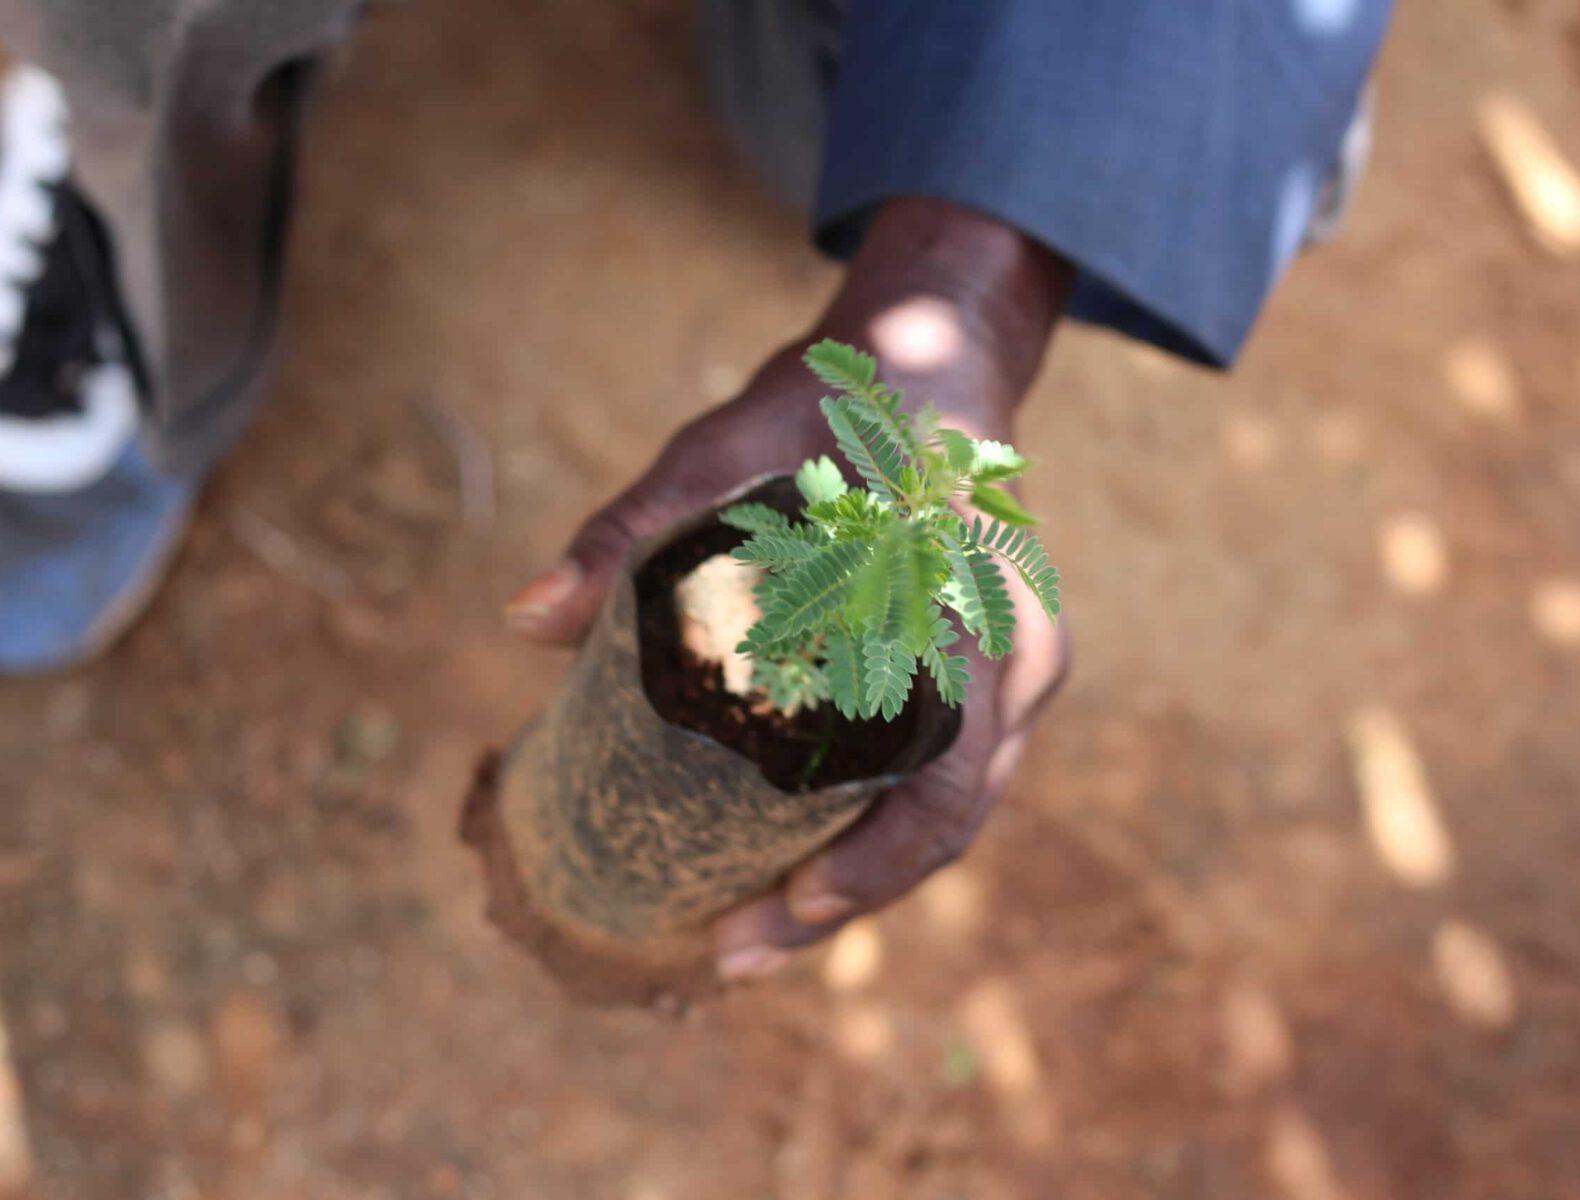 Trees for the future planting tree Tanzania